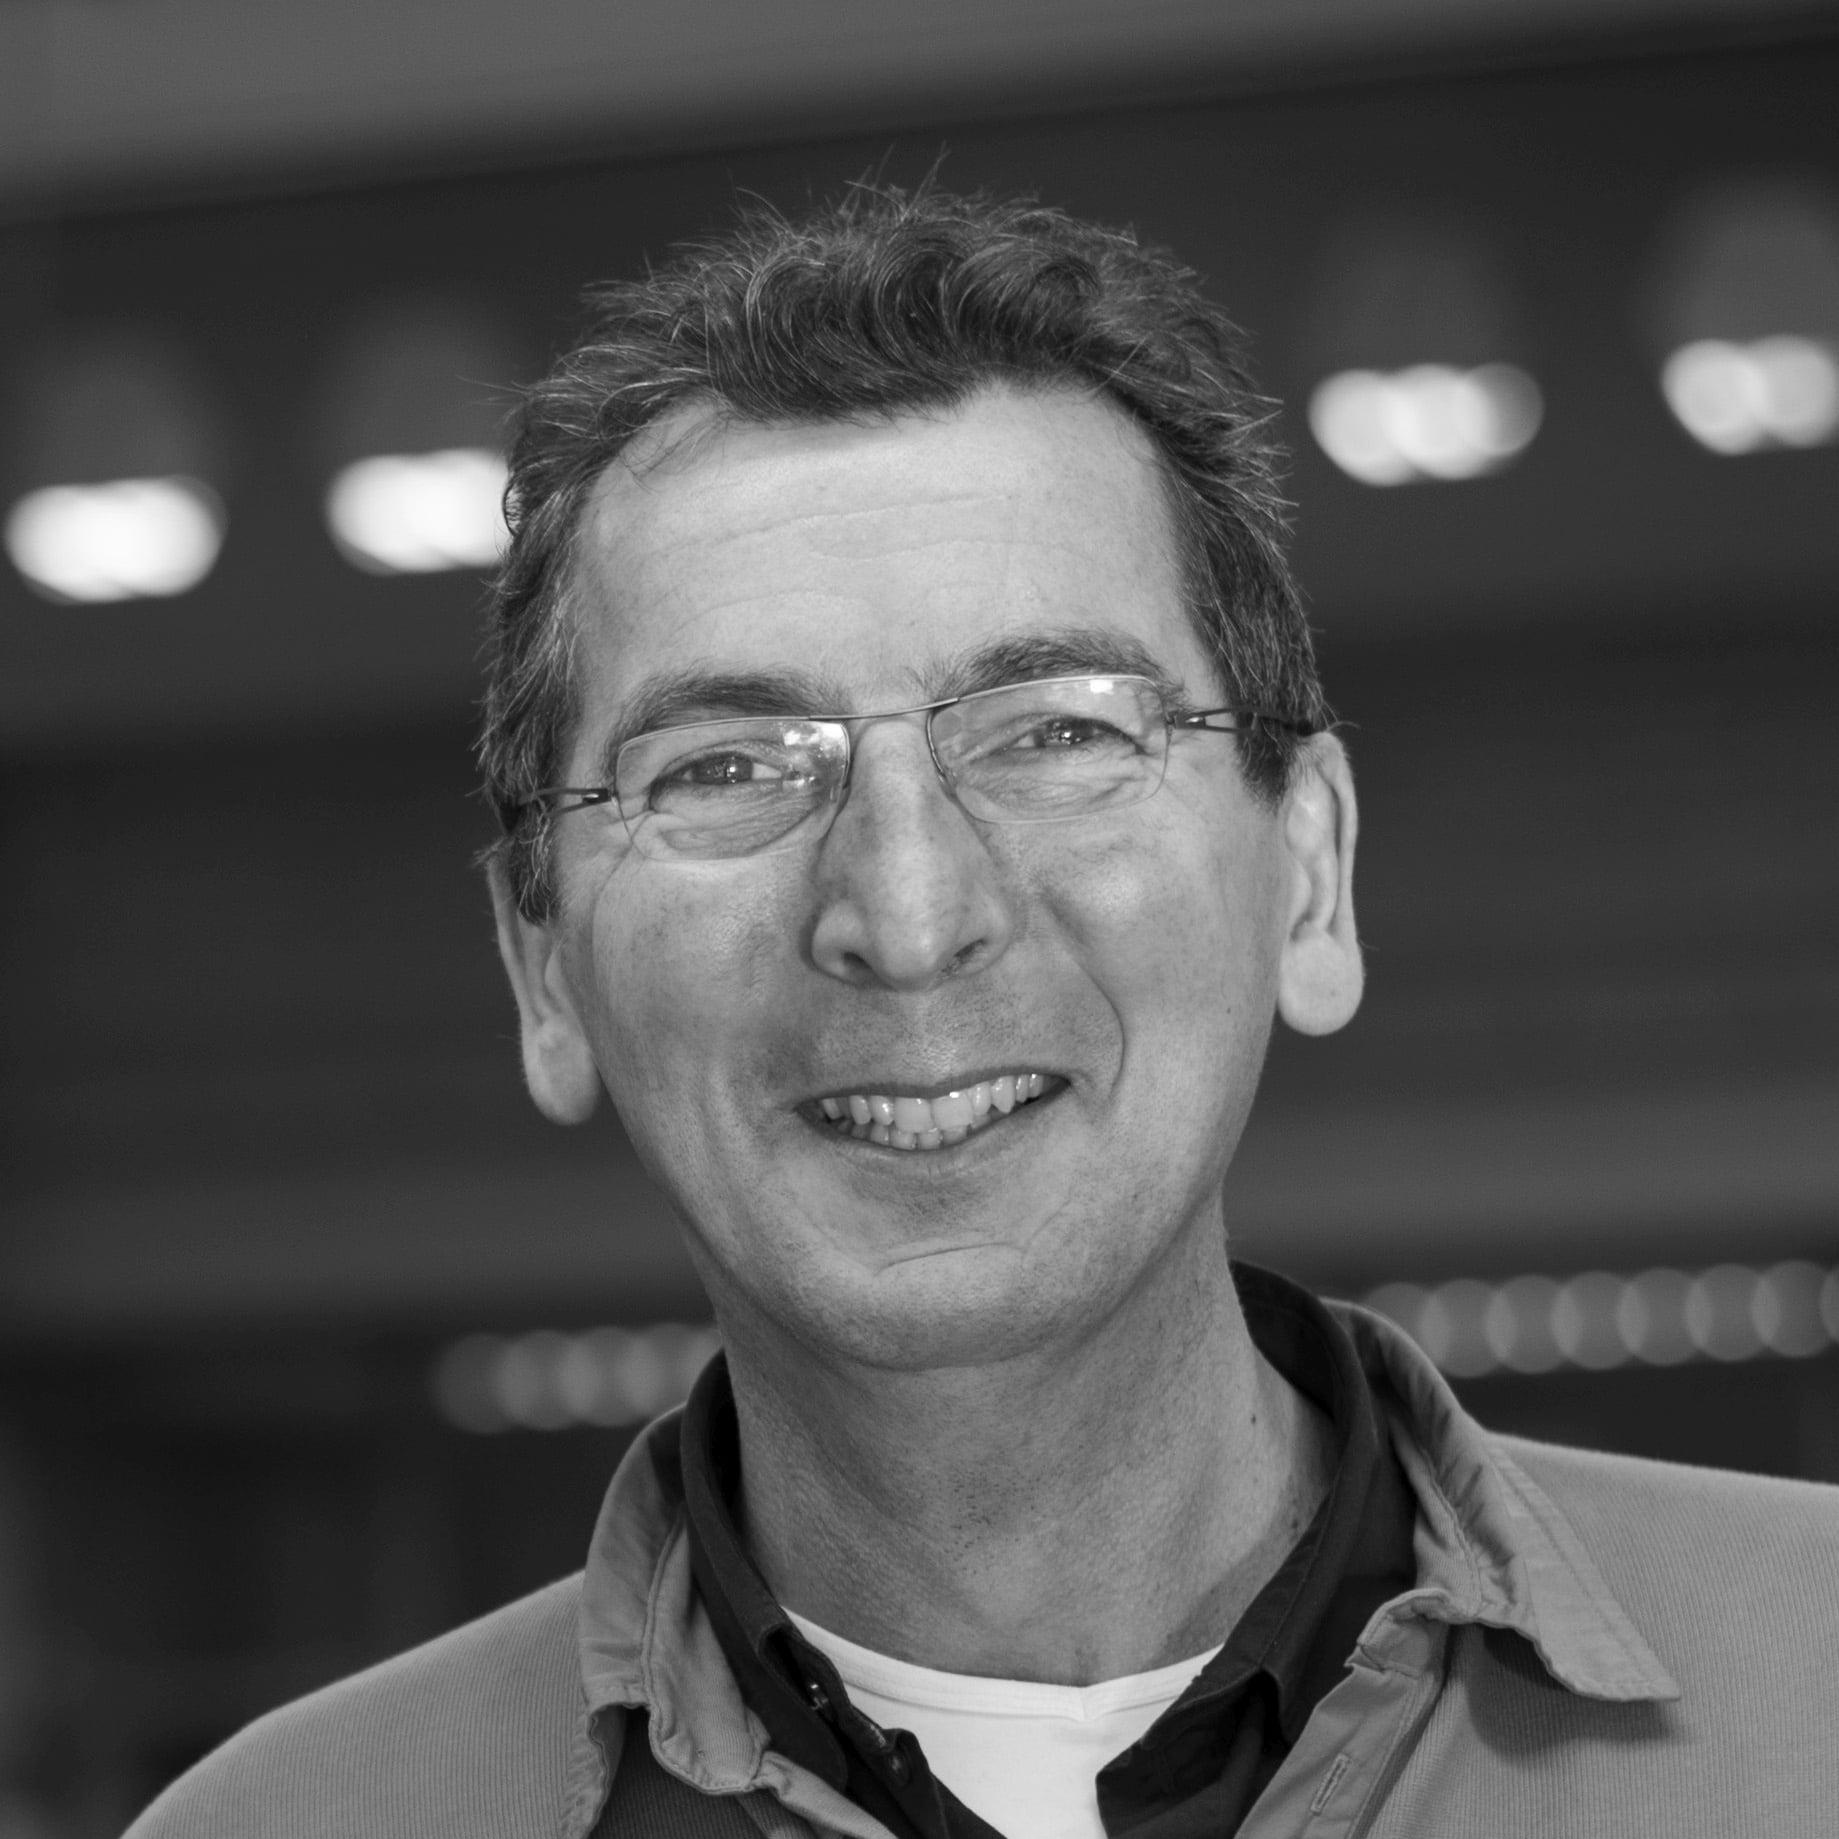 Manfred van der Voort ICR3ATE